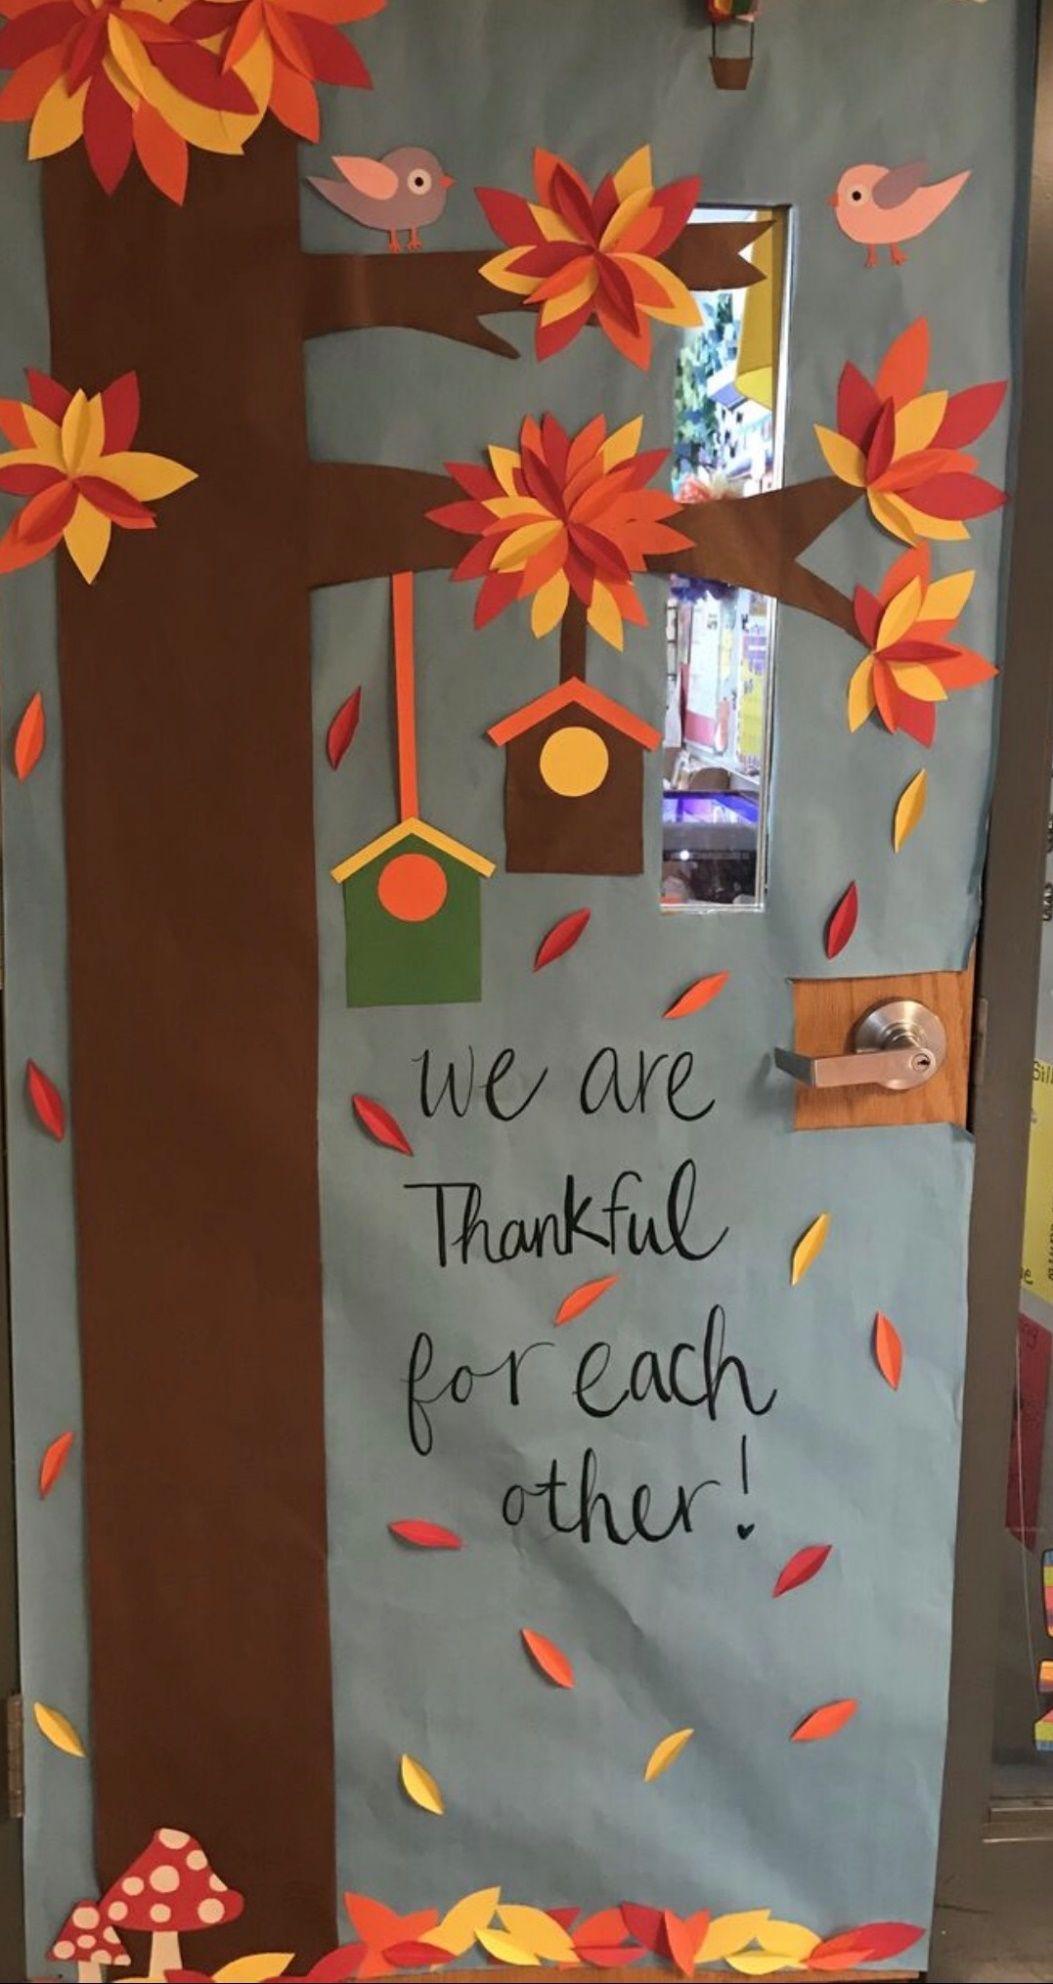 35 Best Classroom Decoration Ideas For Fall Fall Classroom Decorations School Door Decorations Fall Classroom Door